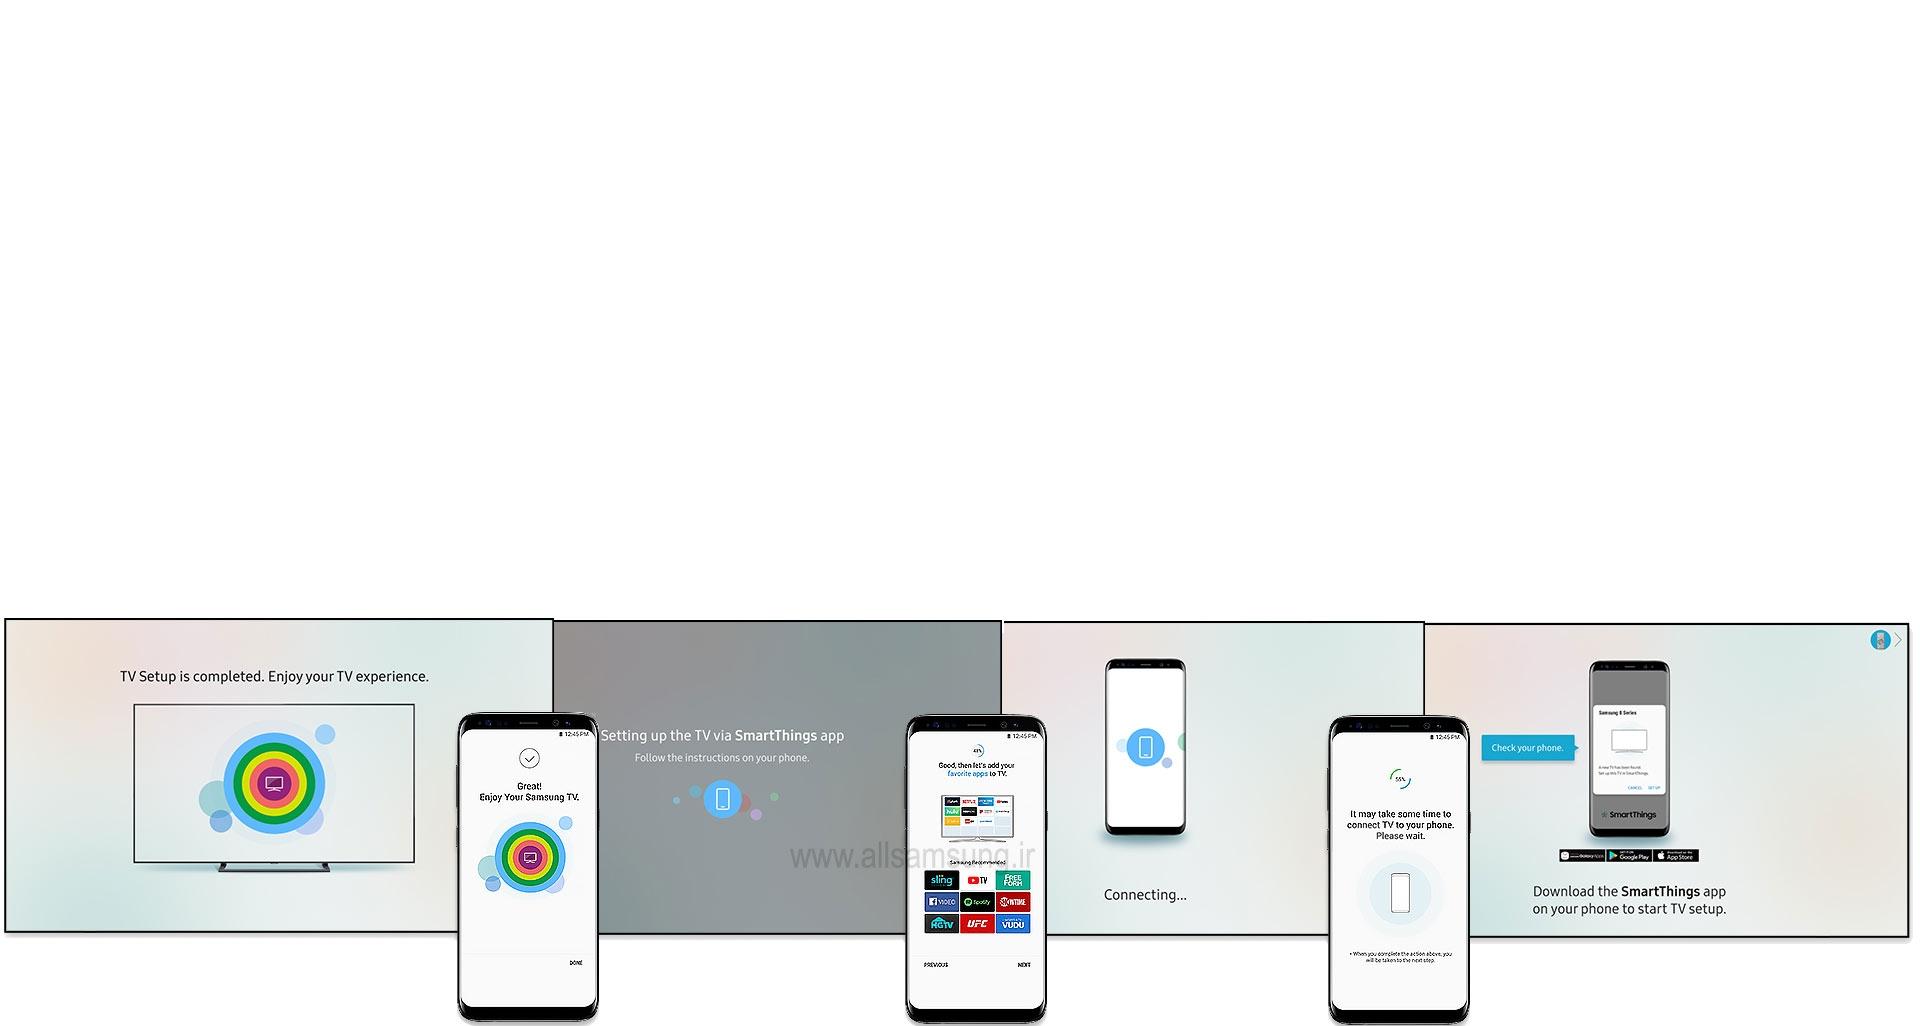 نصب آسان اپلیکیشن SmartThings بر روی گوشی هوشمند